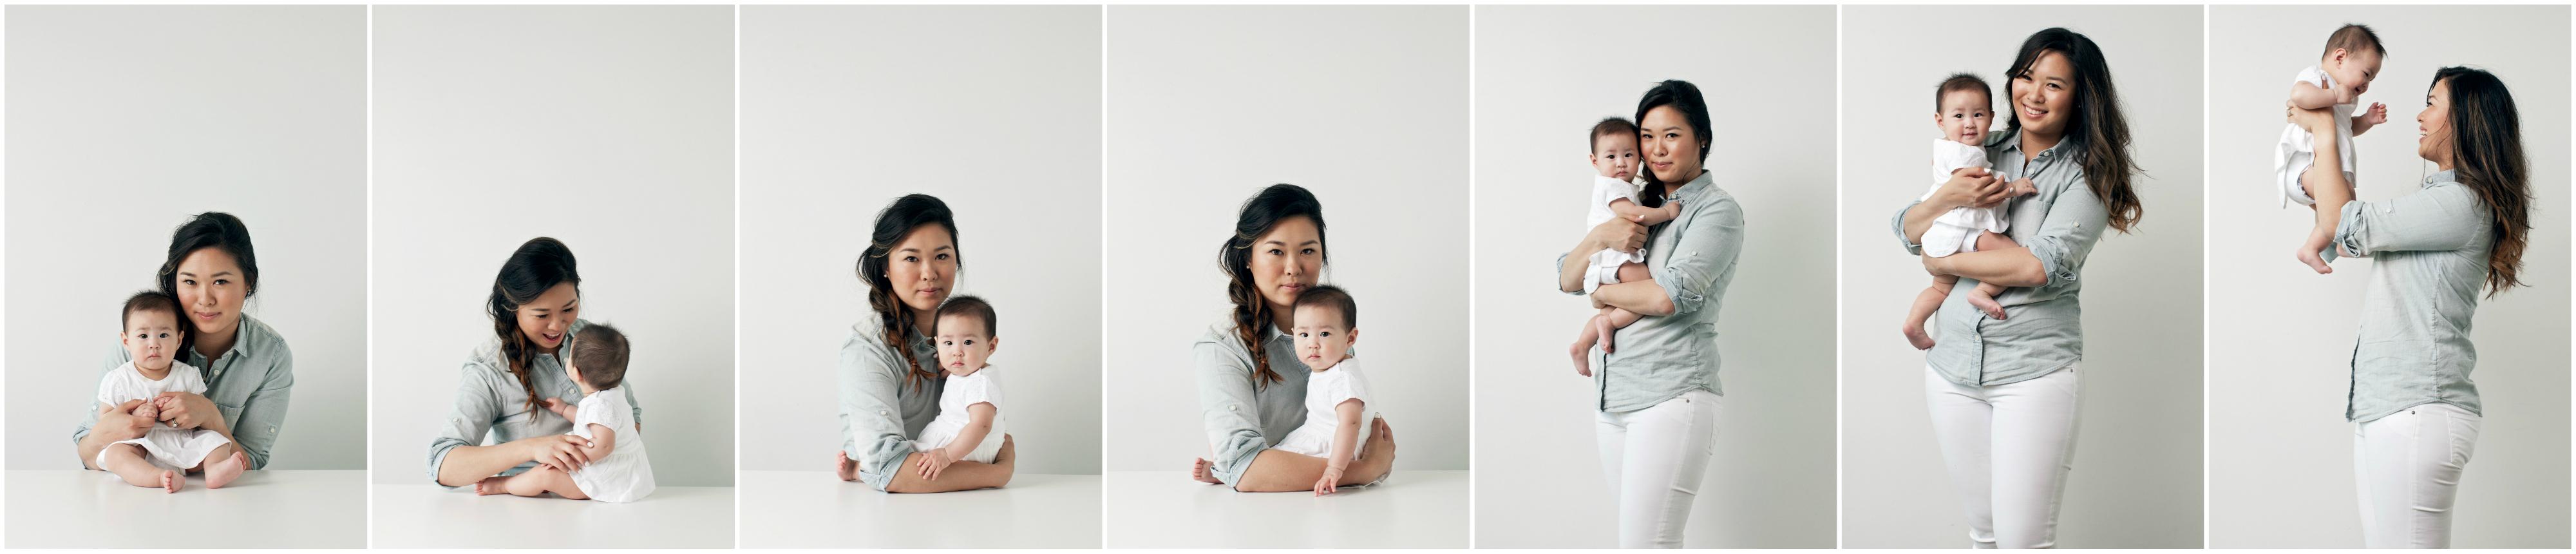 Sandy a la Mode Mother's Day horizontal